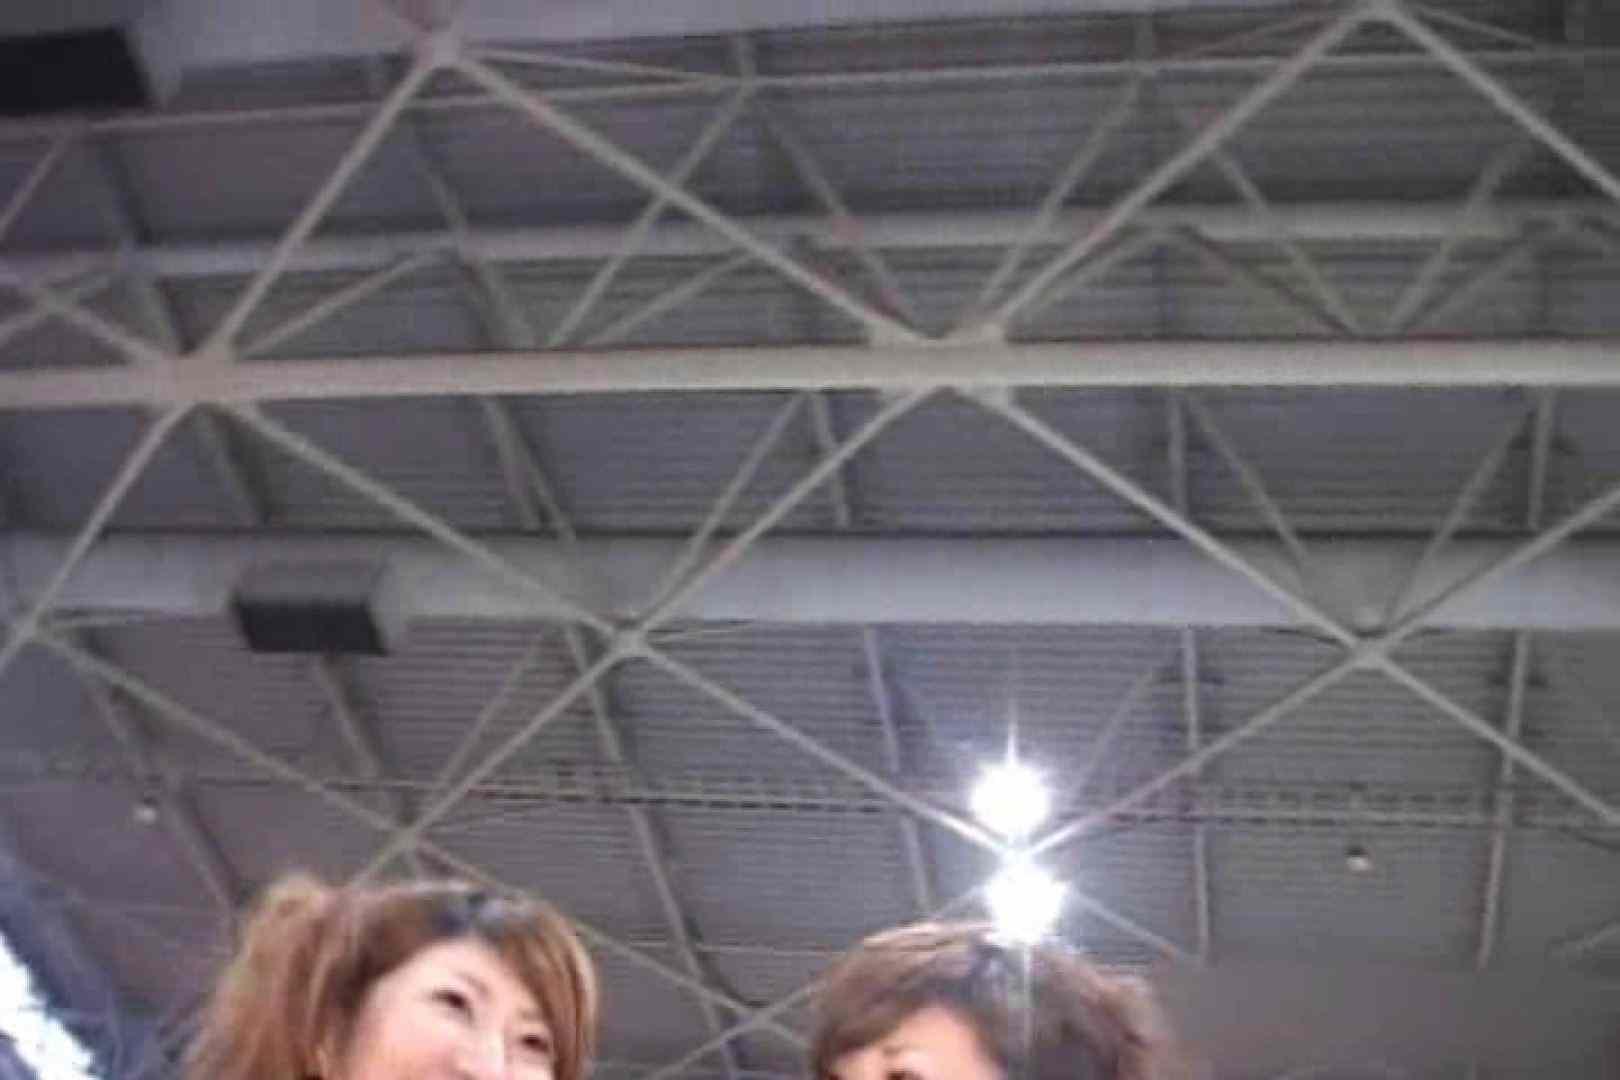 RQカメラ地獄Vol.31 胸チラ AV無料動画キャプチャ 86pic 64